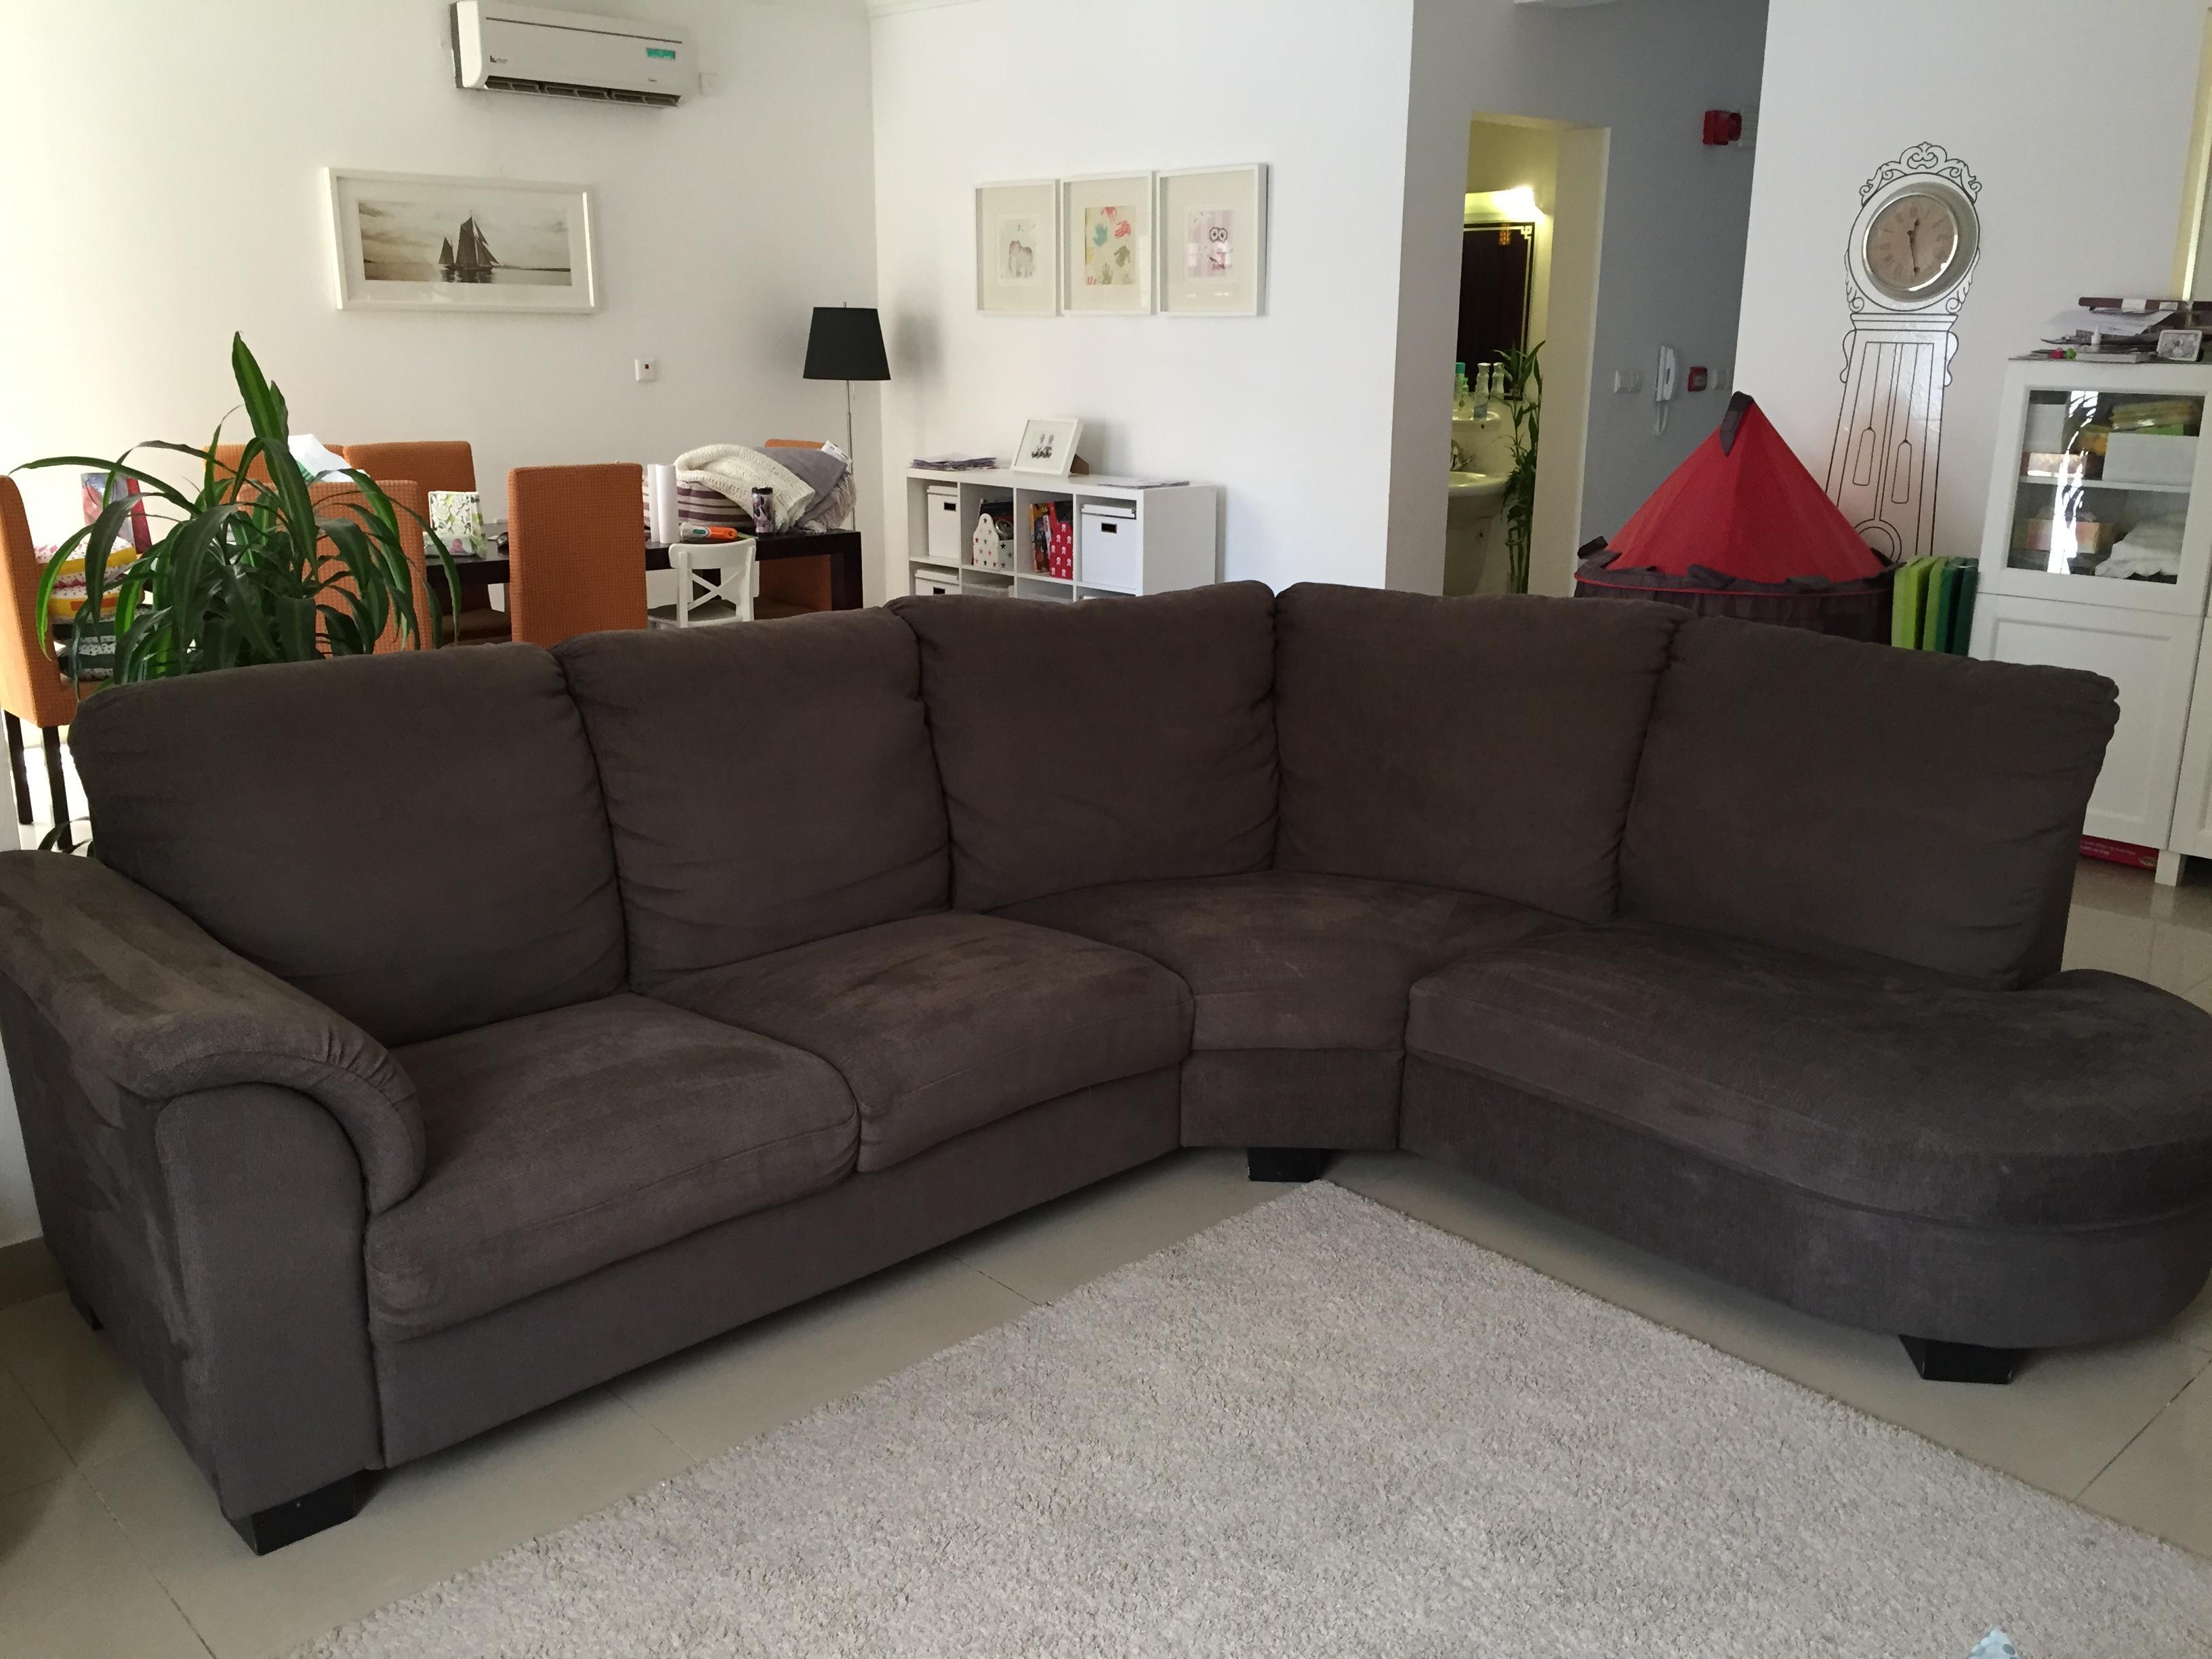 Excellent Condition Ikea TIDAFORS Corner Sofa with Arm Left